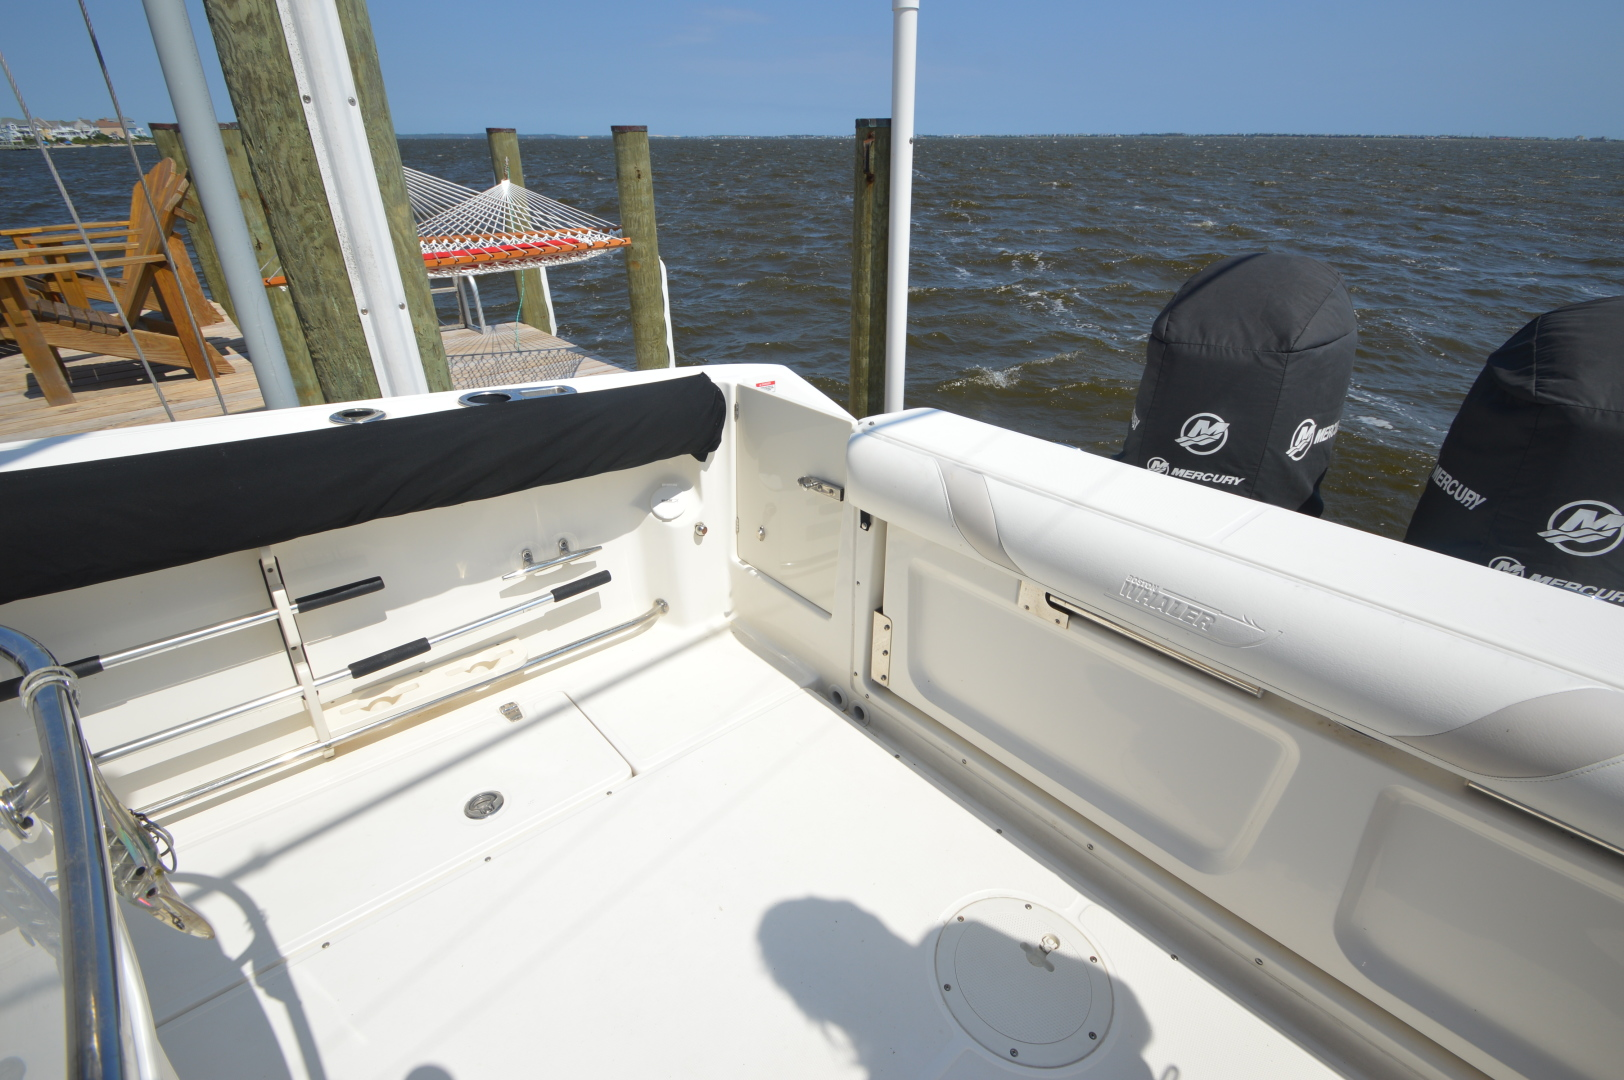 Boston Whaler-320 Outrage 2008 -Manteo-North Carolina-United States-1485482 | Thumbnail